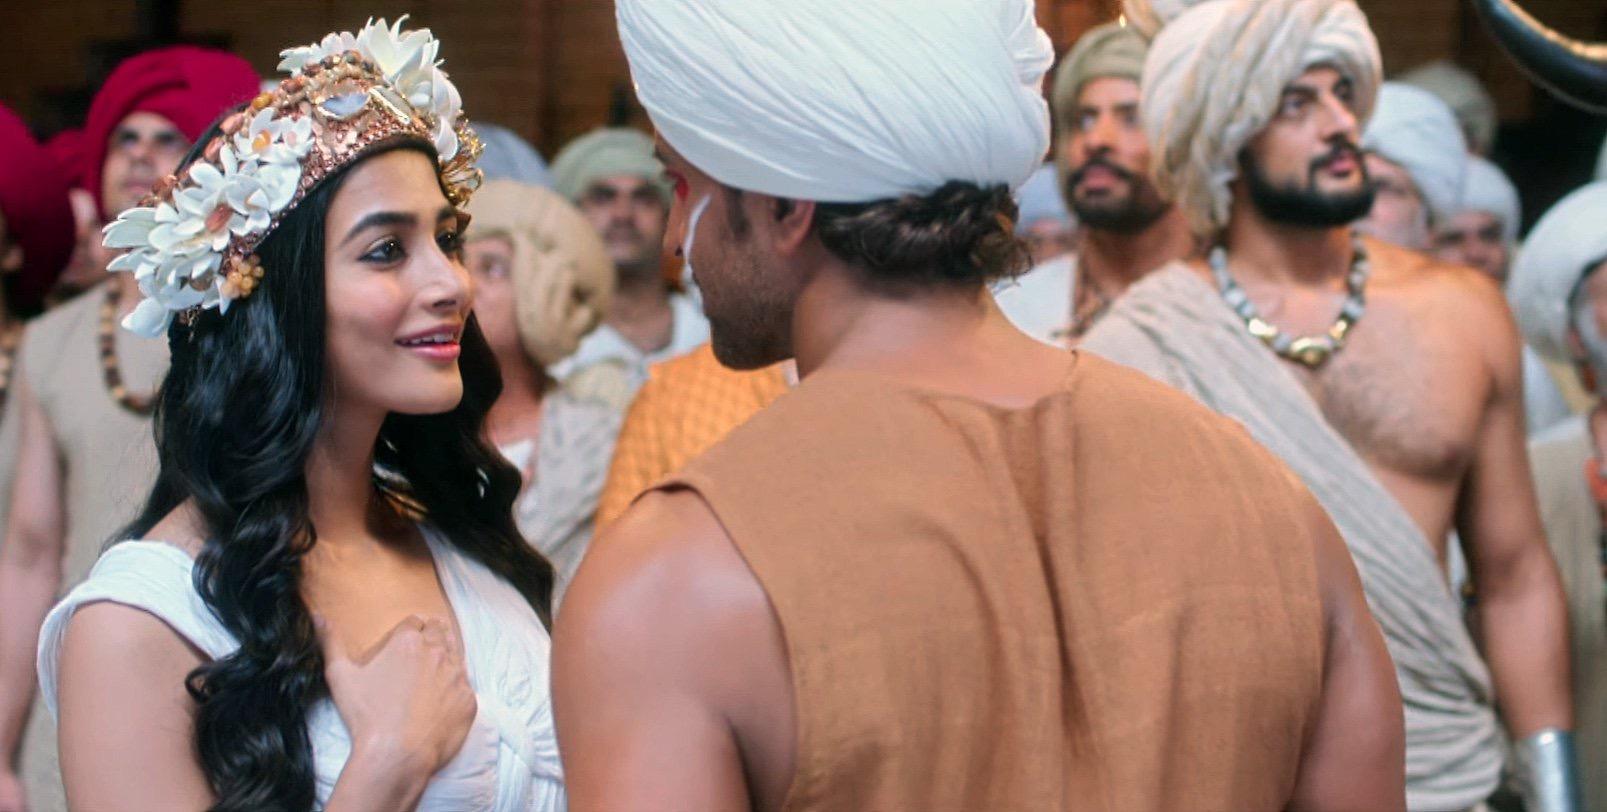 Hrithik Roshan, Arunoday Singh, and Pooja Hegde in Mohenjo Daro (2016)